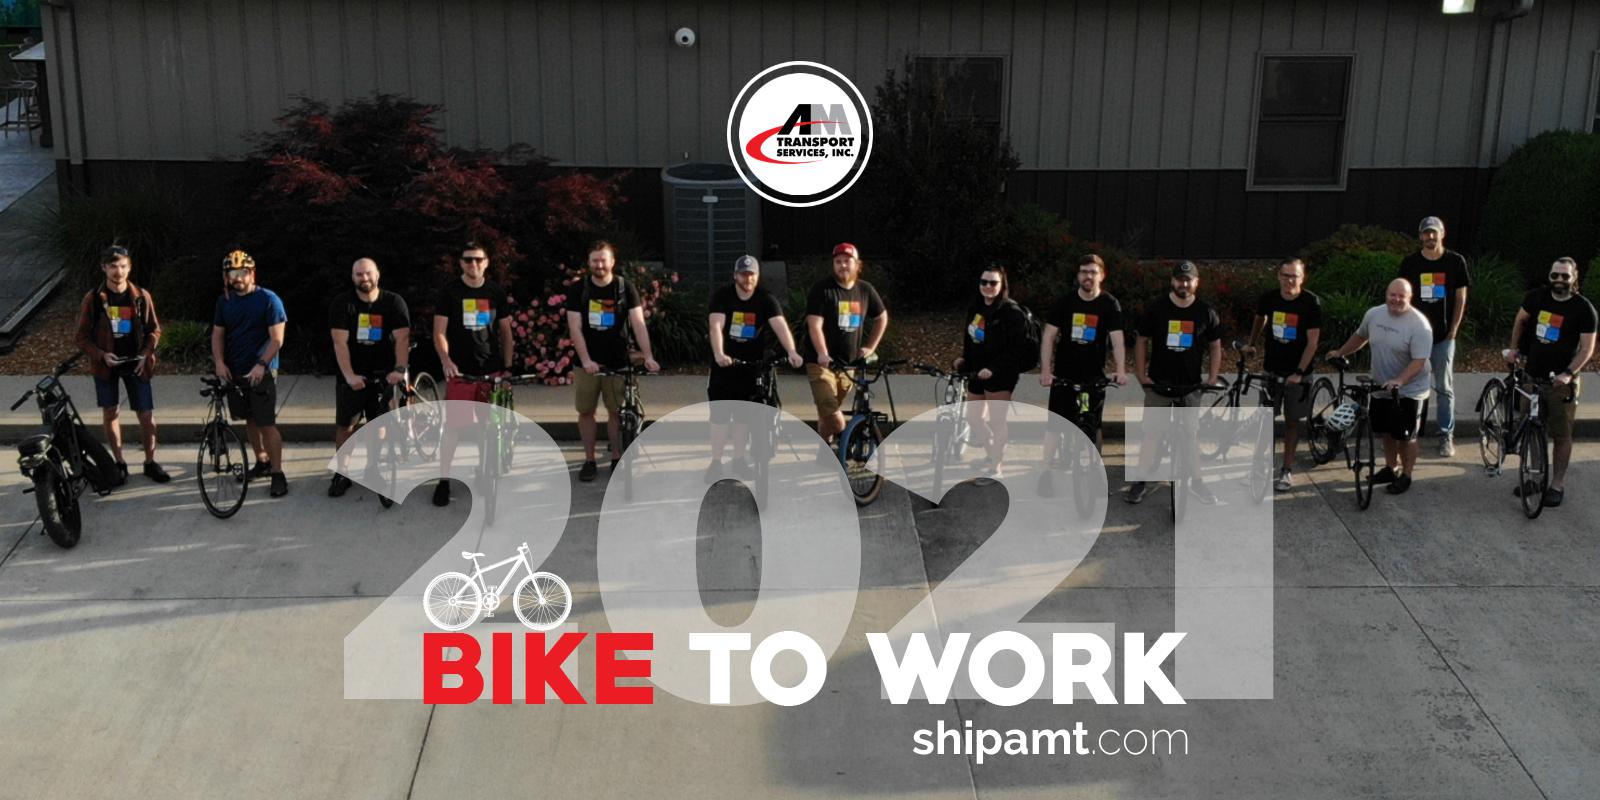 AMT celebrates National Bike to Work Day